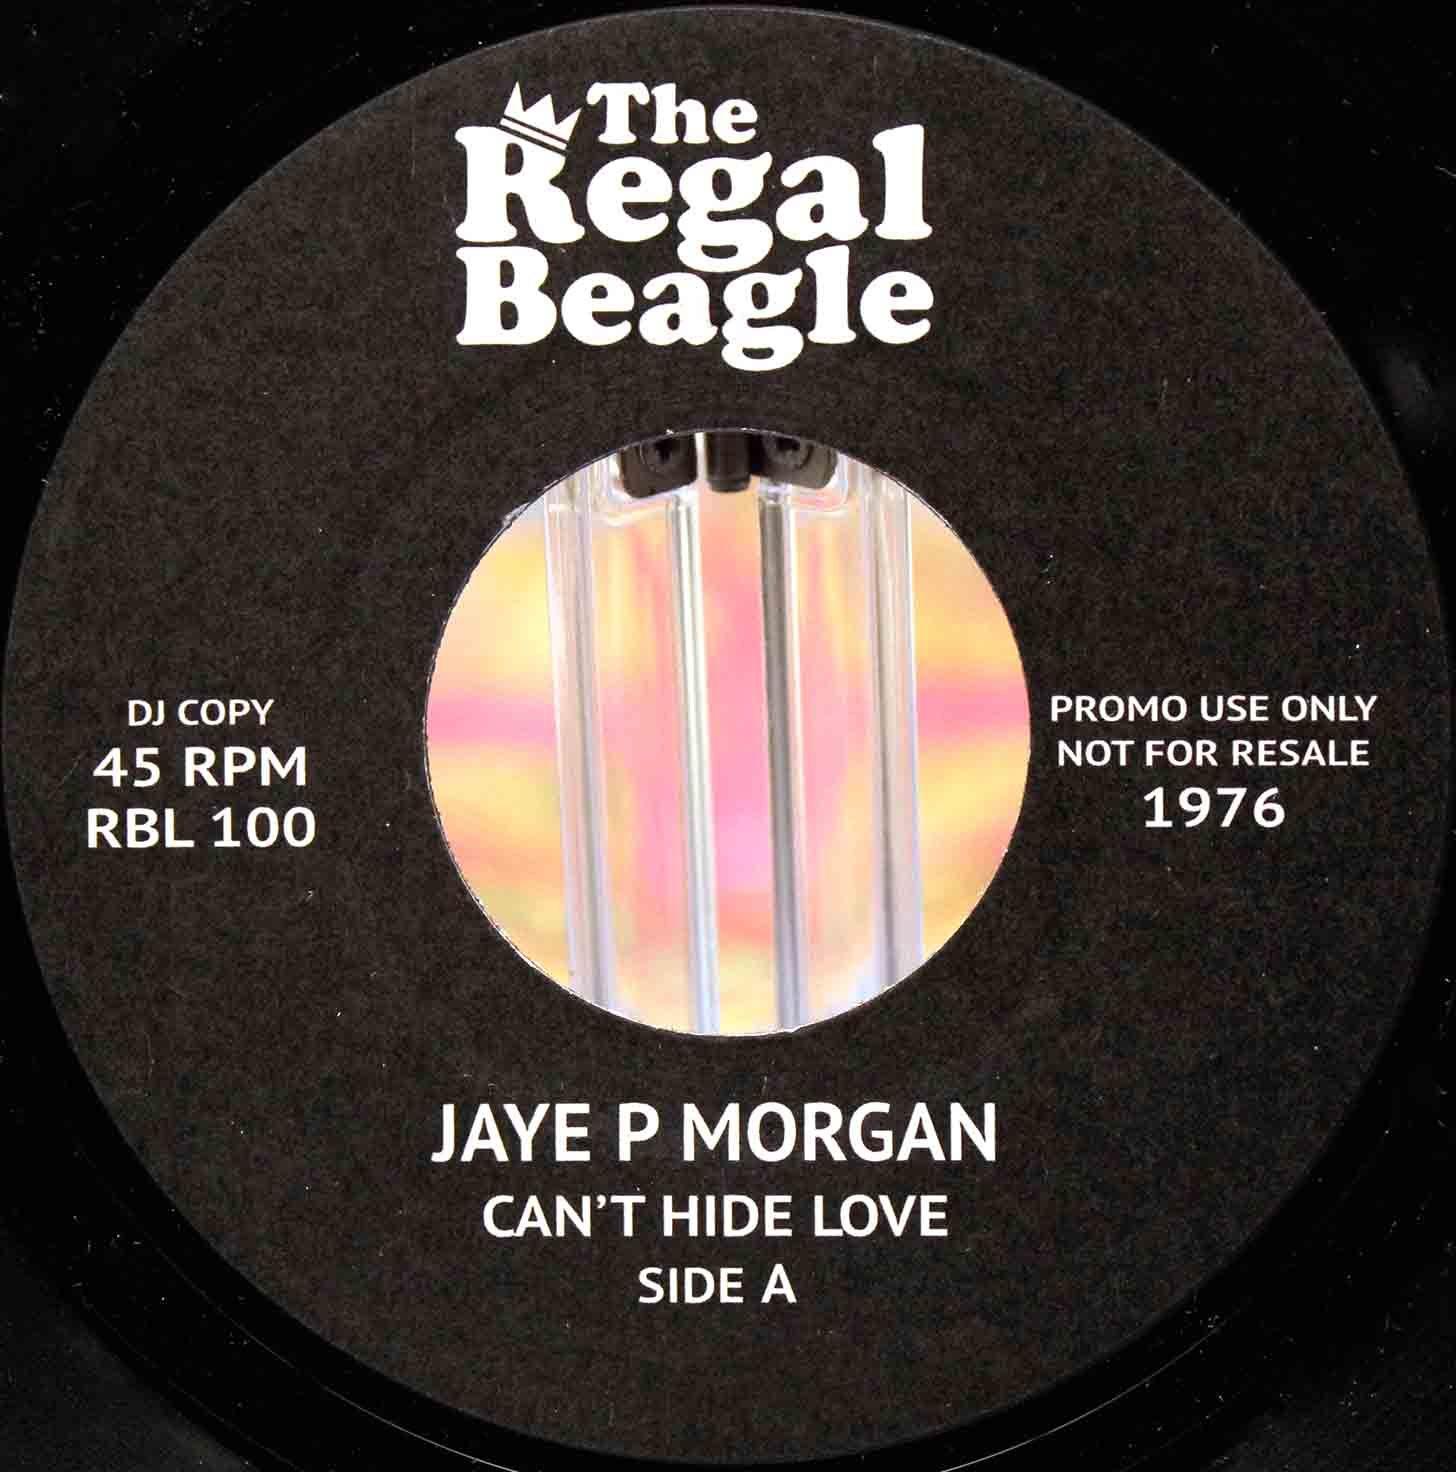 Jaye P Morgan - Cant Hide Love 01 (6)